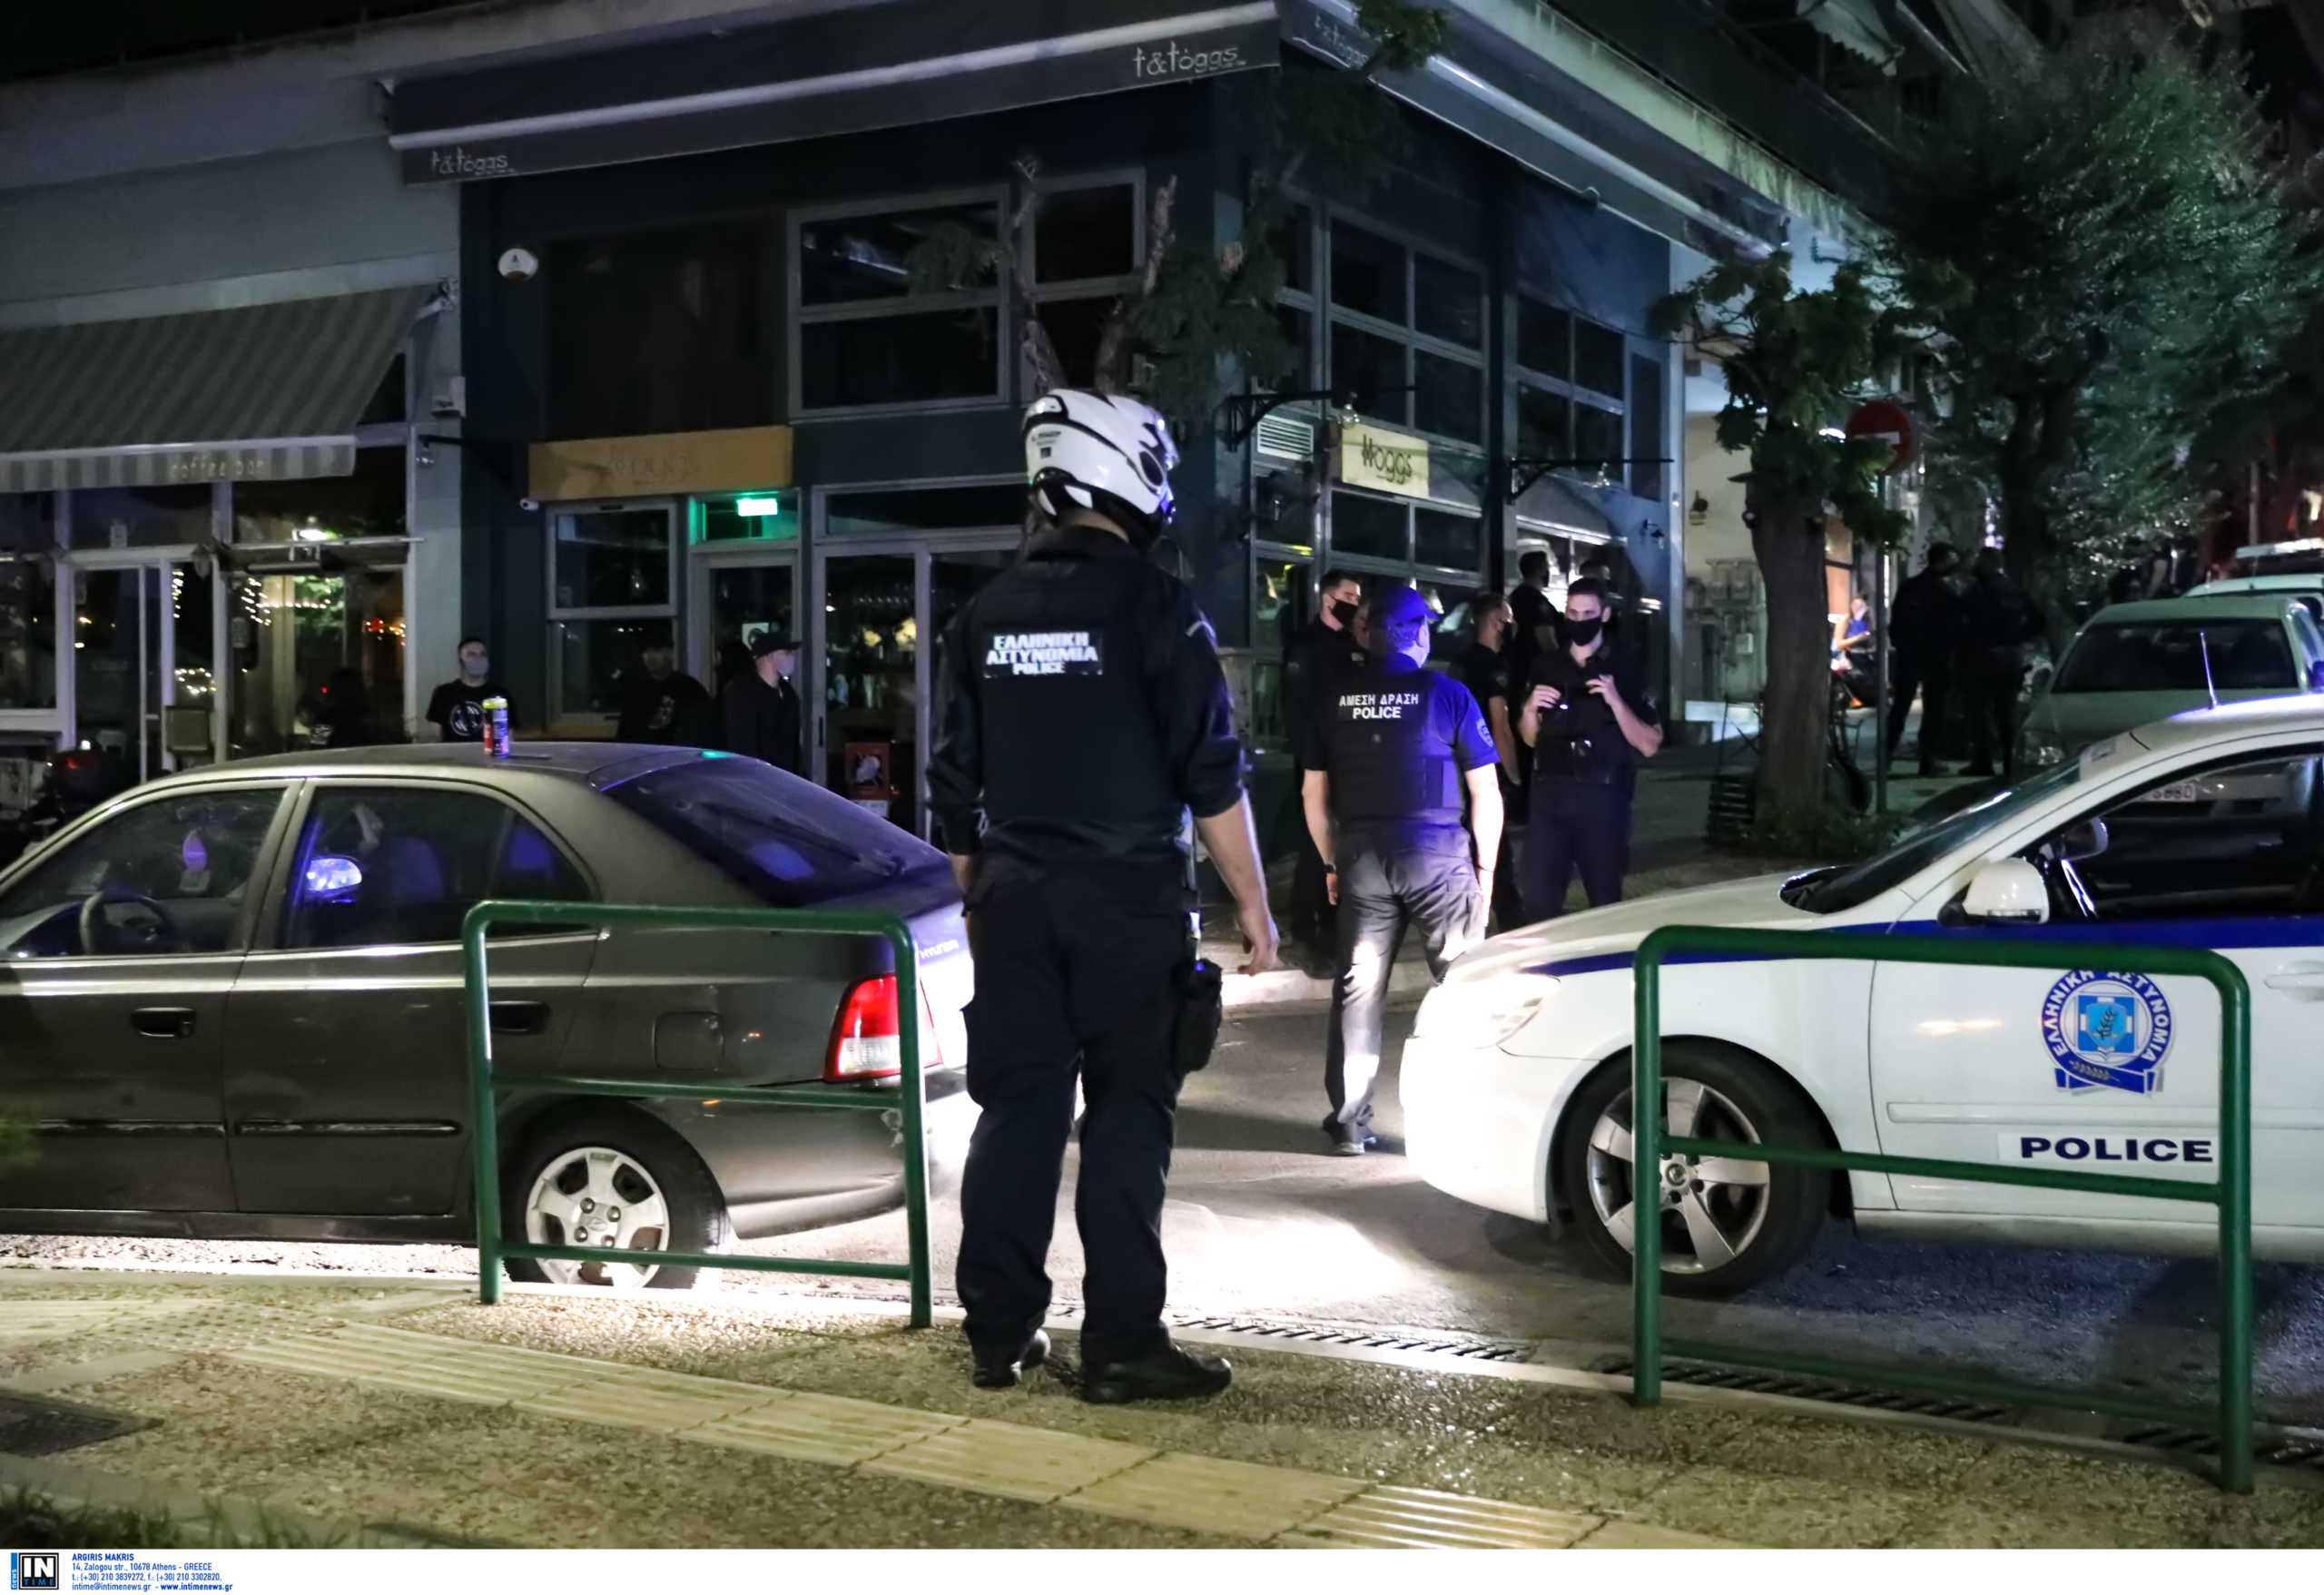 Lockdown στις πλατείες: «Γέμισε» αστυνομία, άδειασε από κόσμο η πλατεία Βαρνάβα (pics, vid)